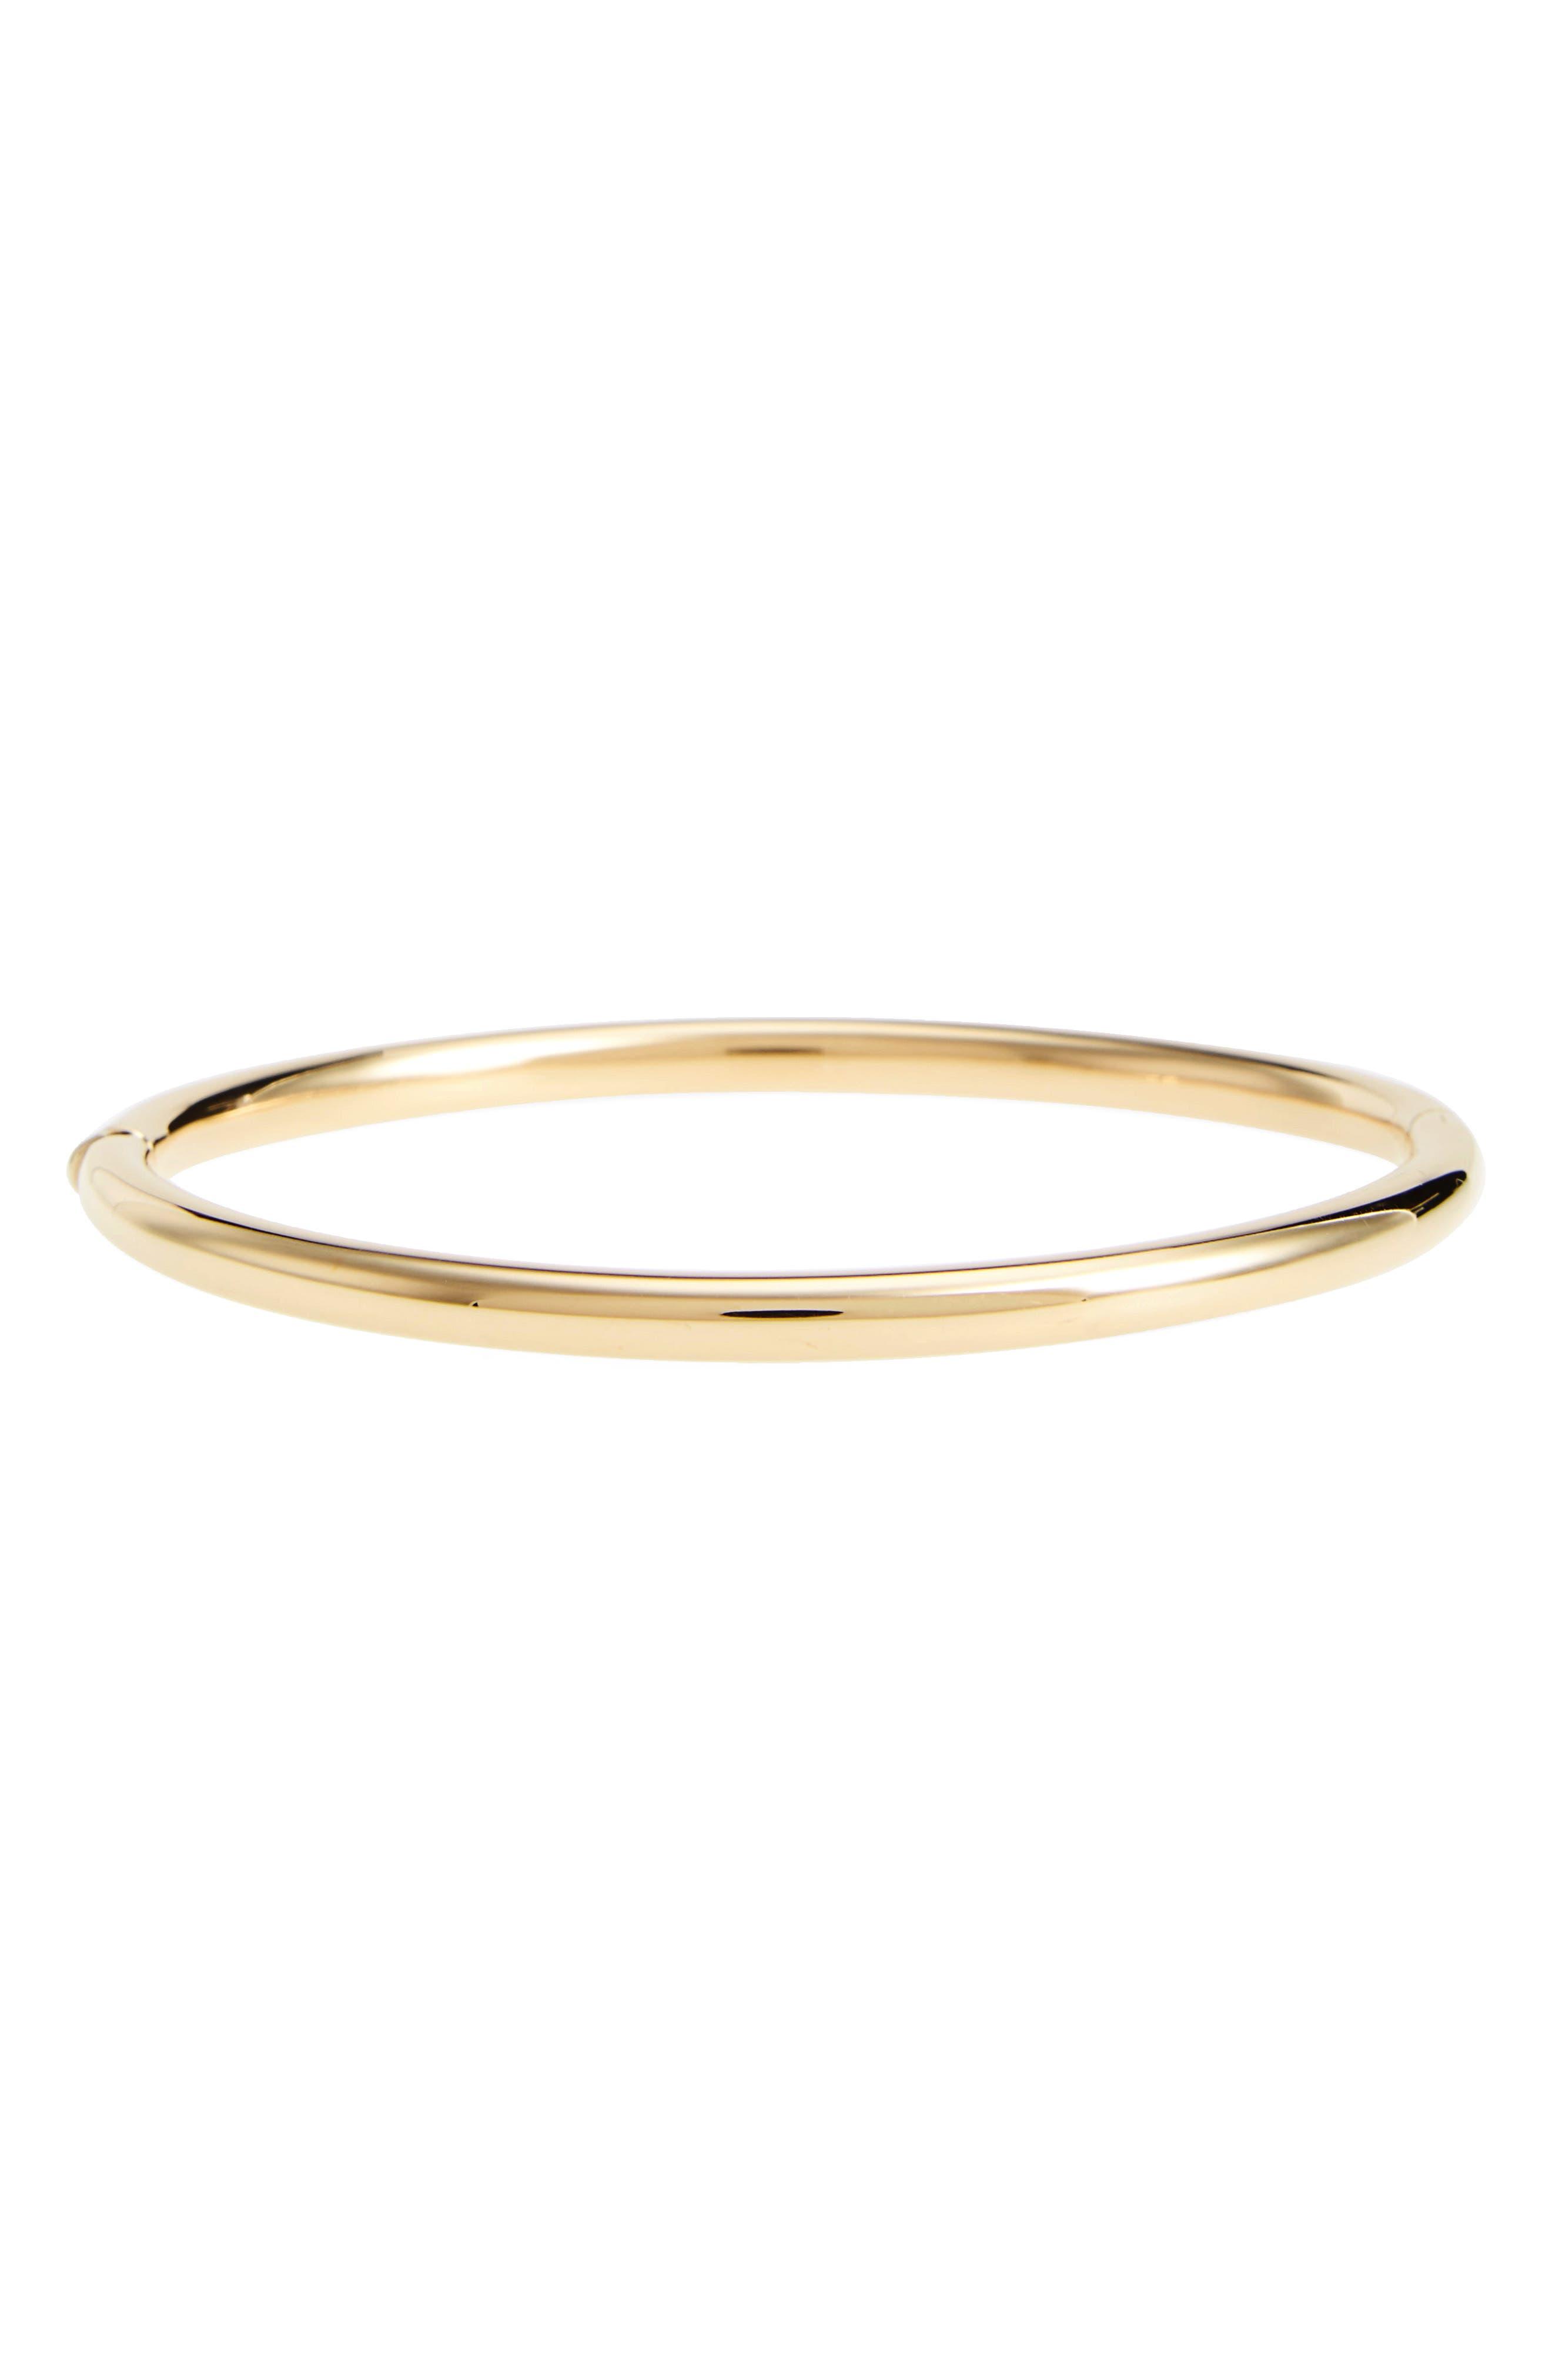 Slim Bangle Bracelet,                         Main,                         color, Yellow Gold